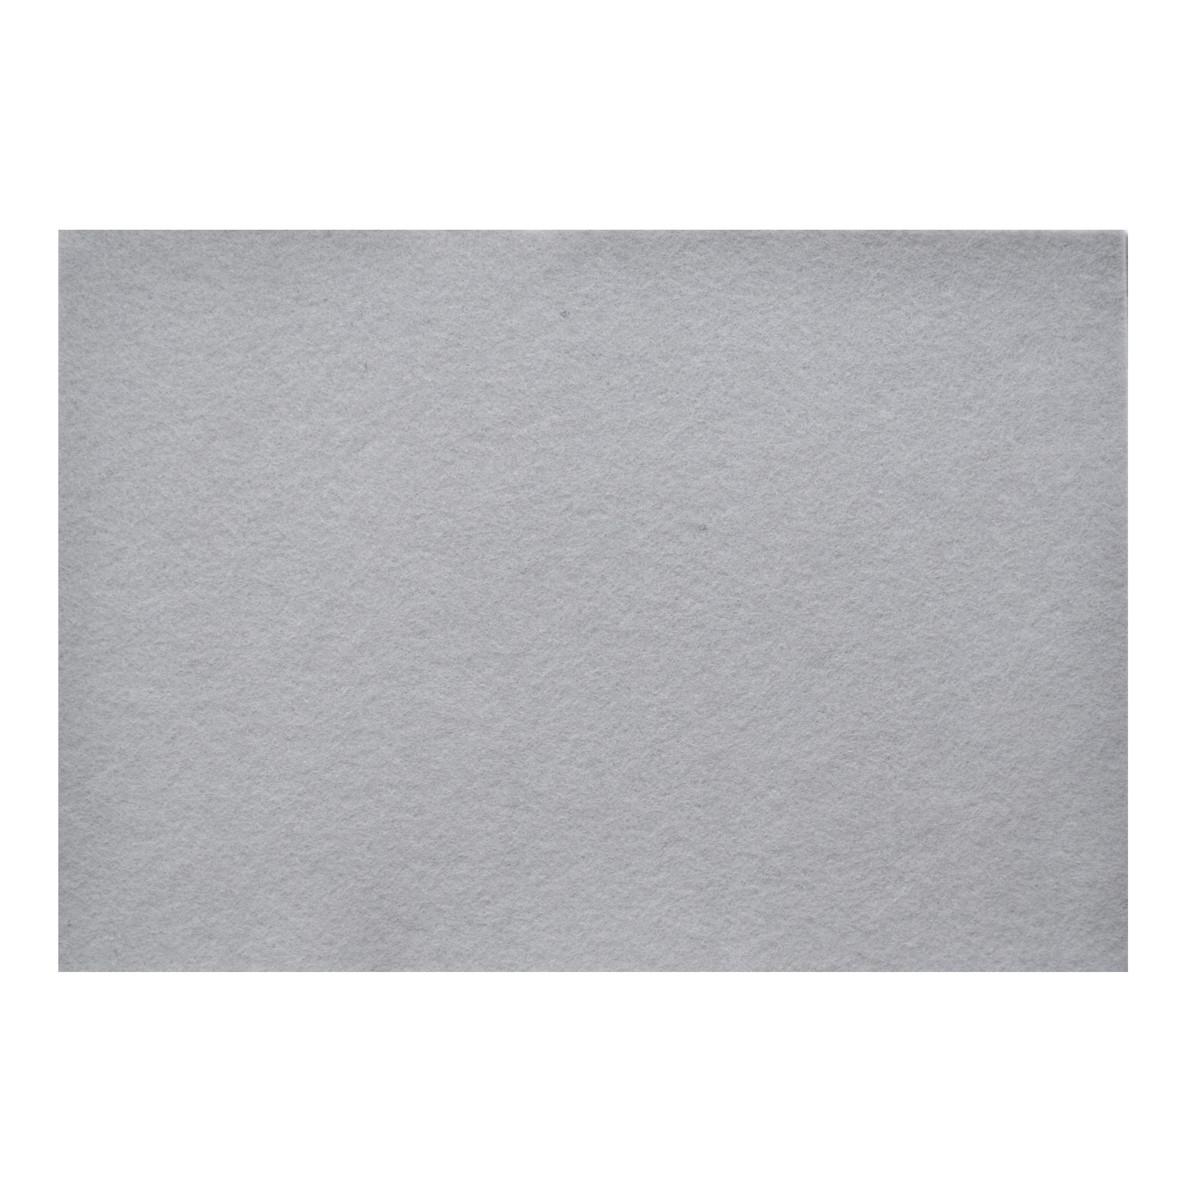 Набор Фетр Santi жесткий, светло-серый, 21*30см (10л)